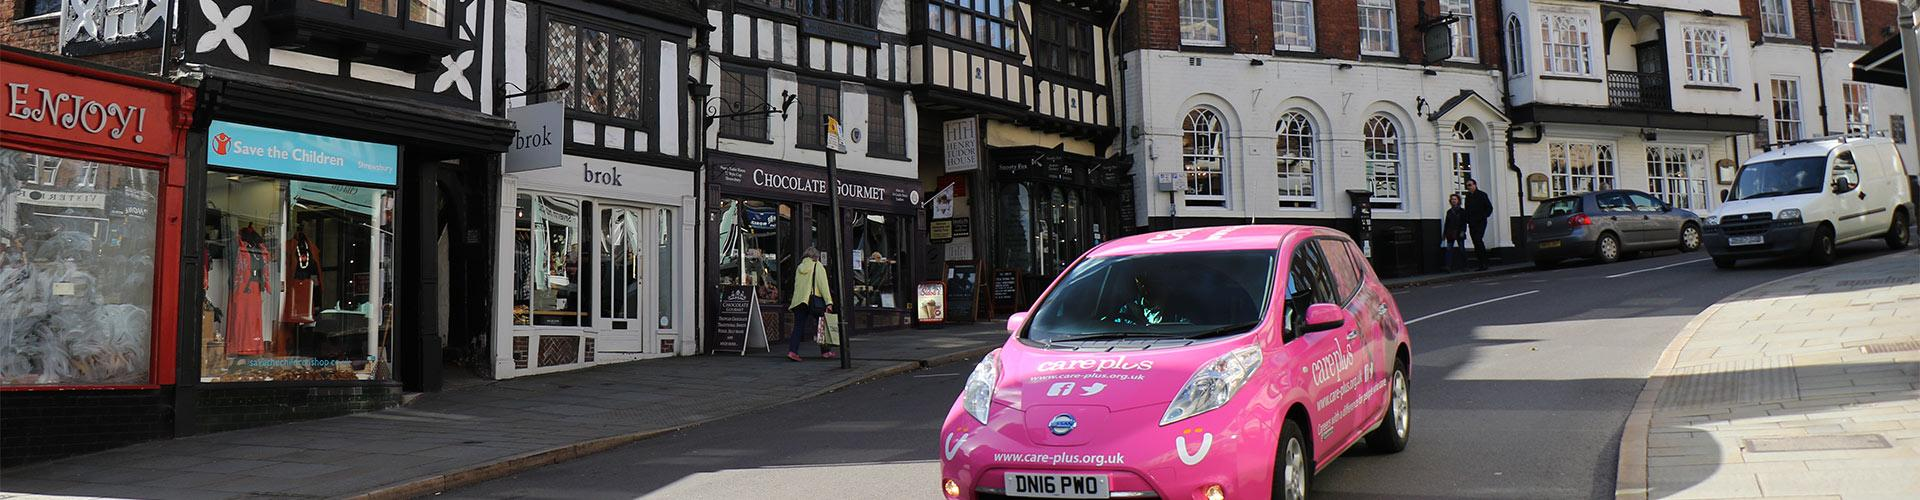 Care Plus car in Shropshire